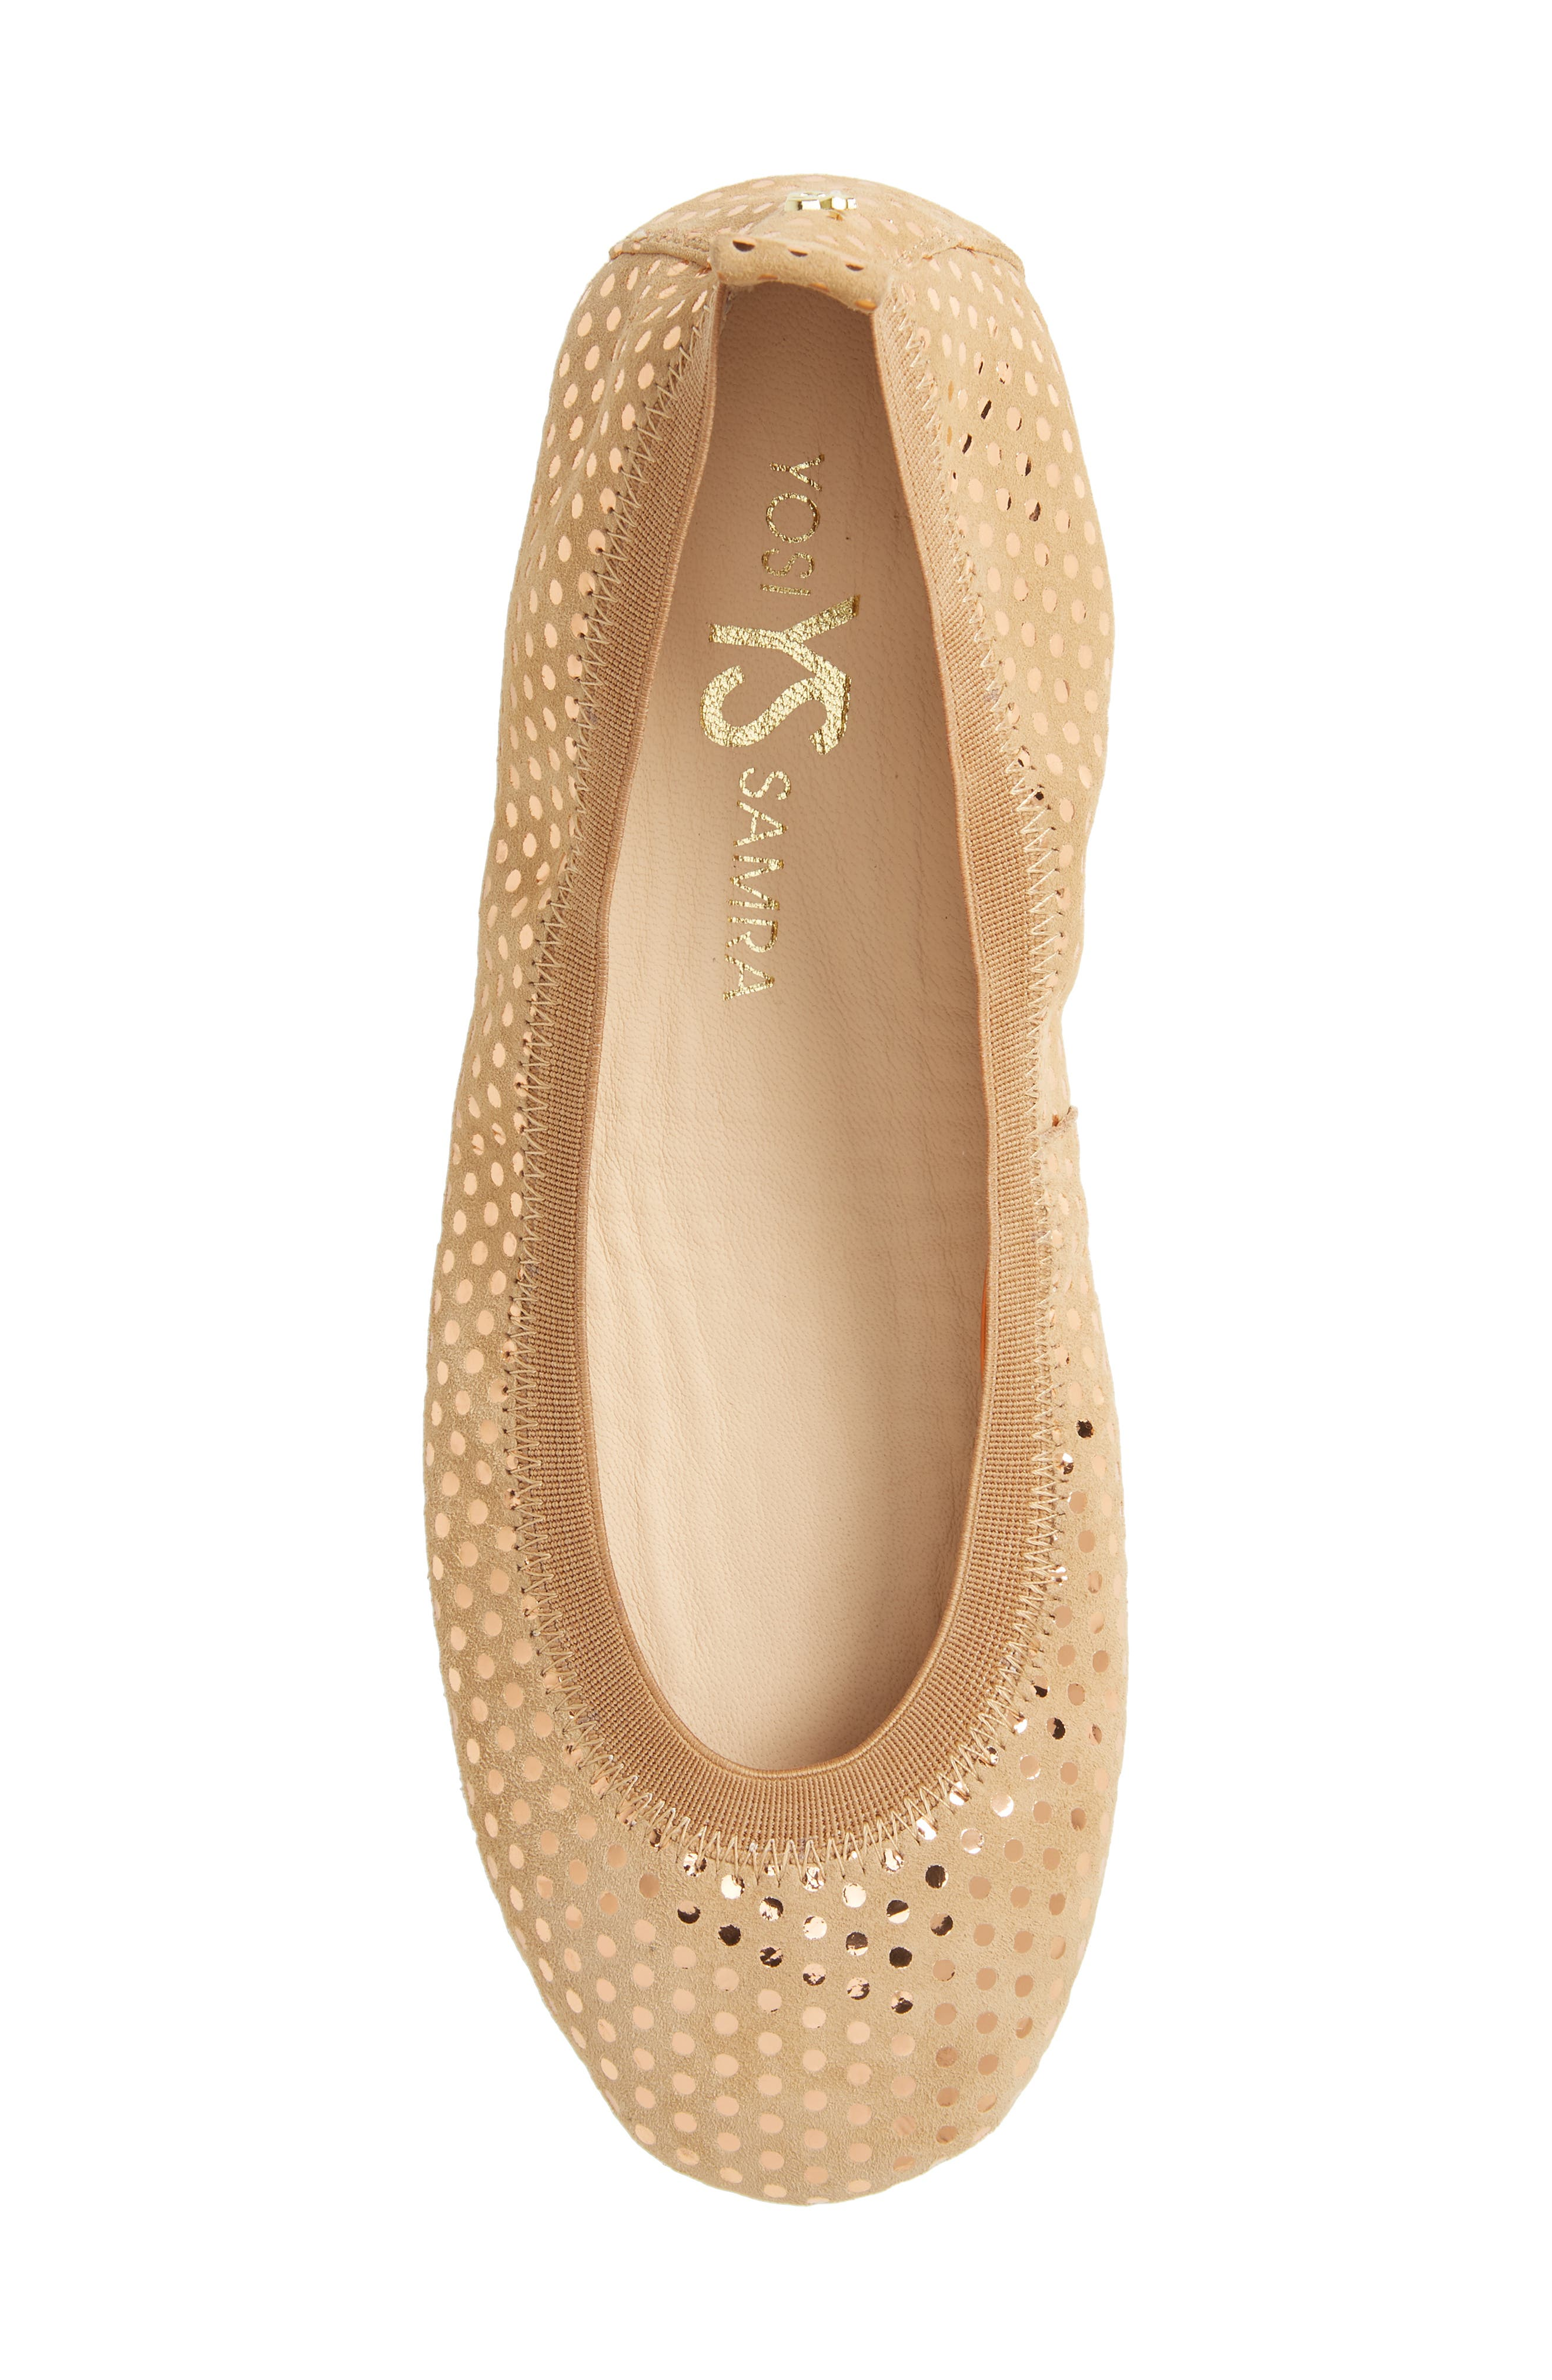 Samara Foldable Ballet Flat,                             Alternate thumbnail 6, color,                             Latte Suede